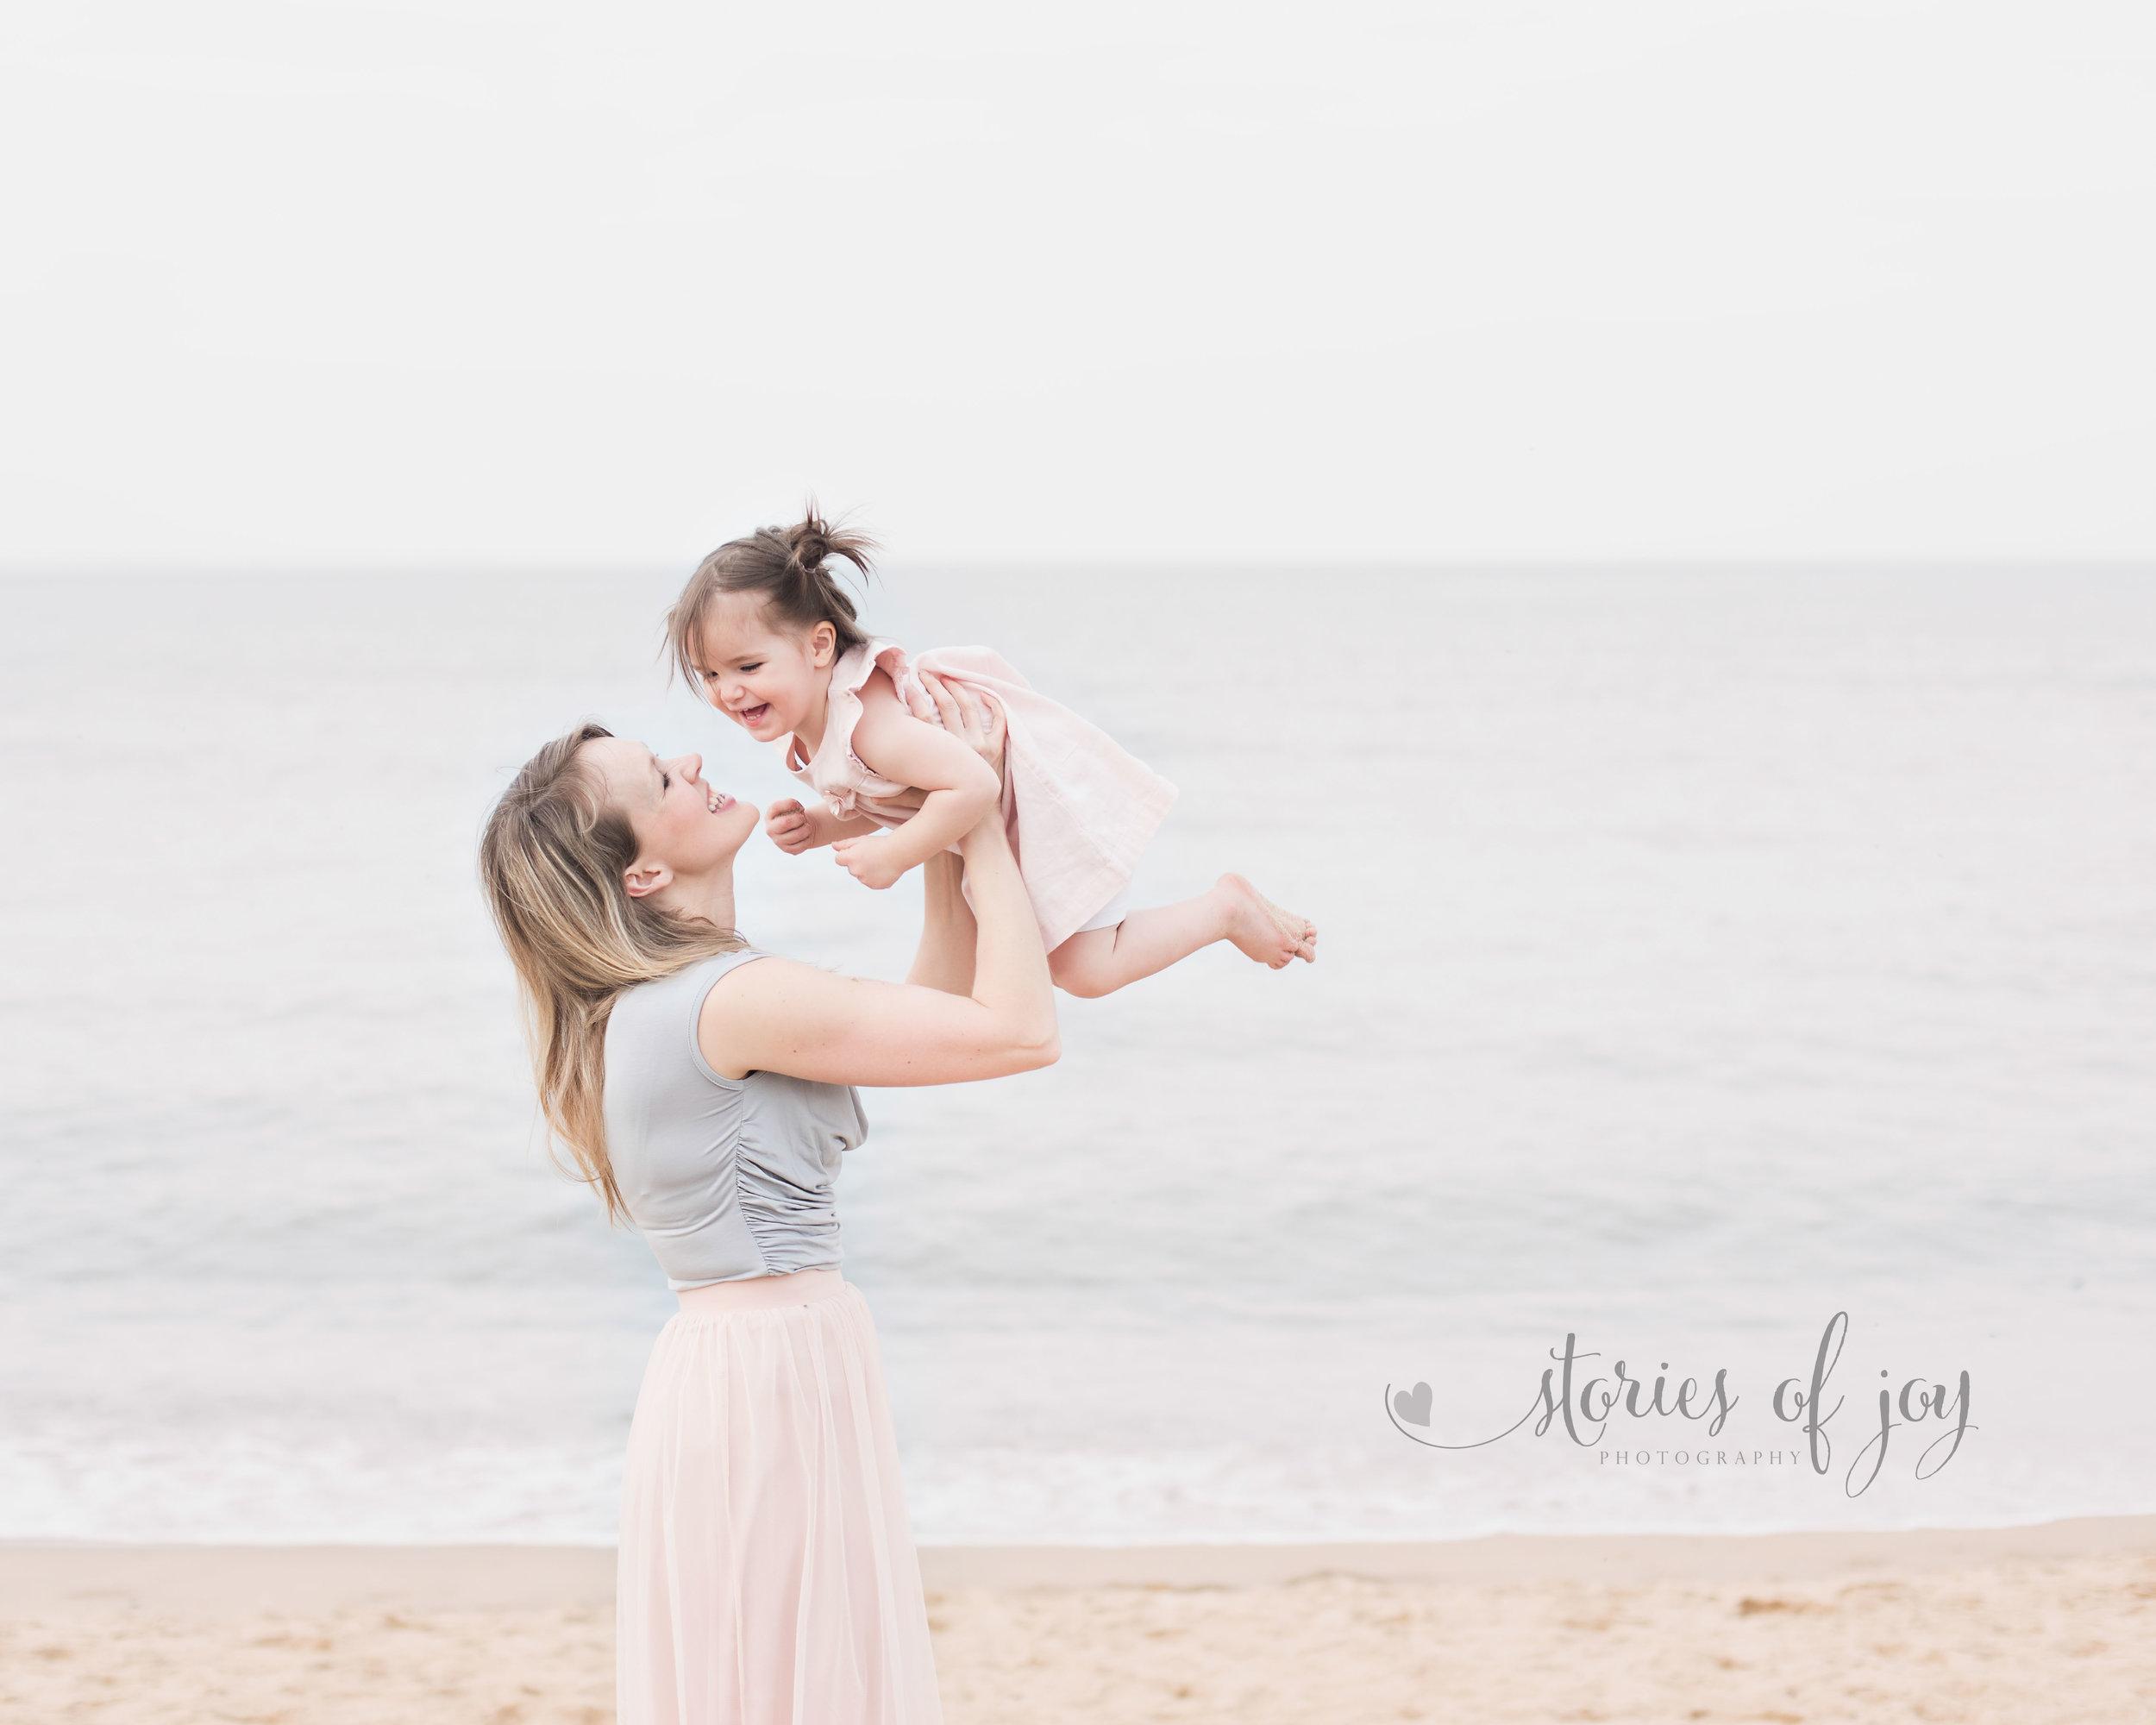 mother-children-beach-photo-session-vero-beach-photographer-3.jpg